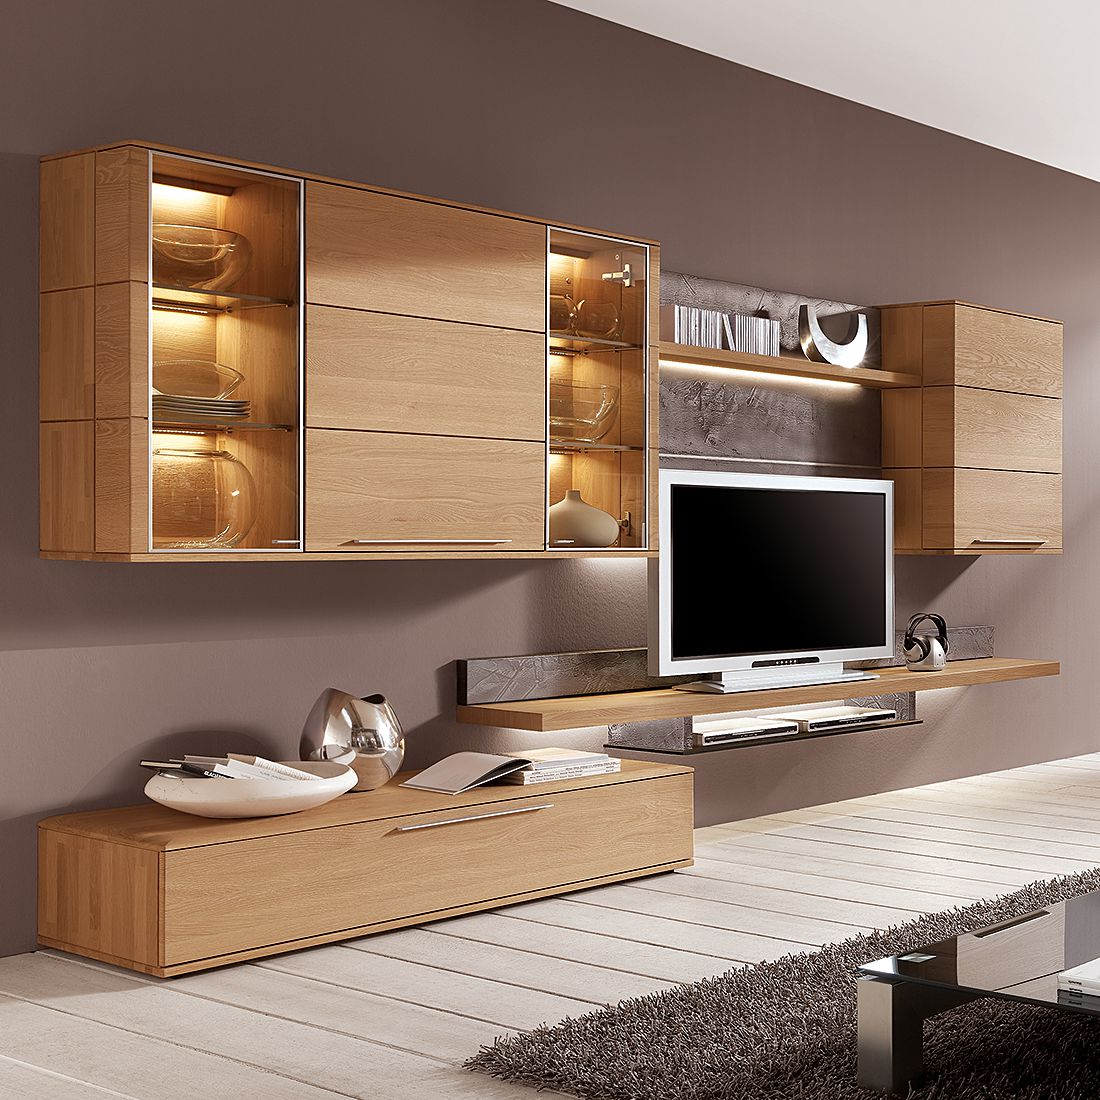 wohnwand alano ii 5 teilig eiche massiv ohne. Black Bedroom Furniture Sets. Home Design Ideas